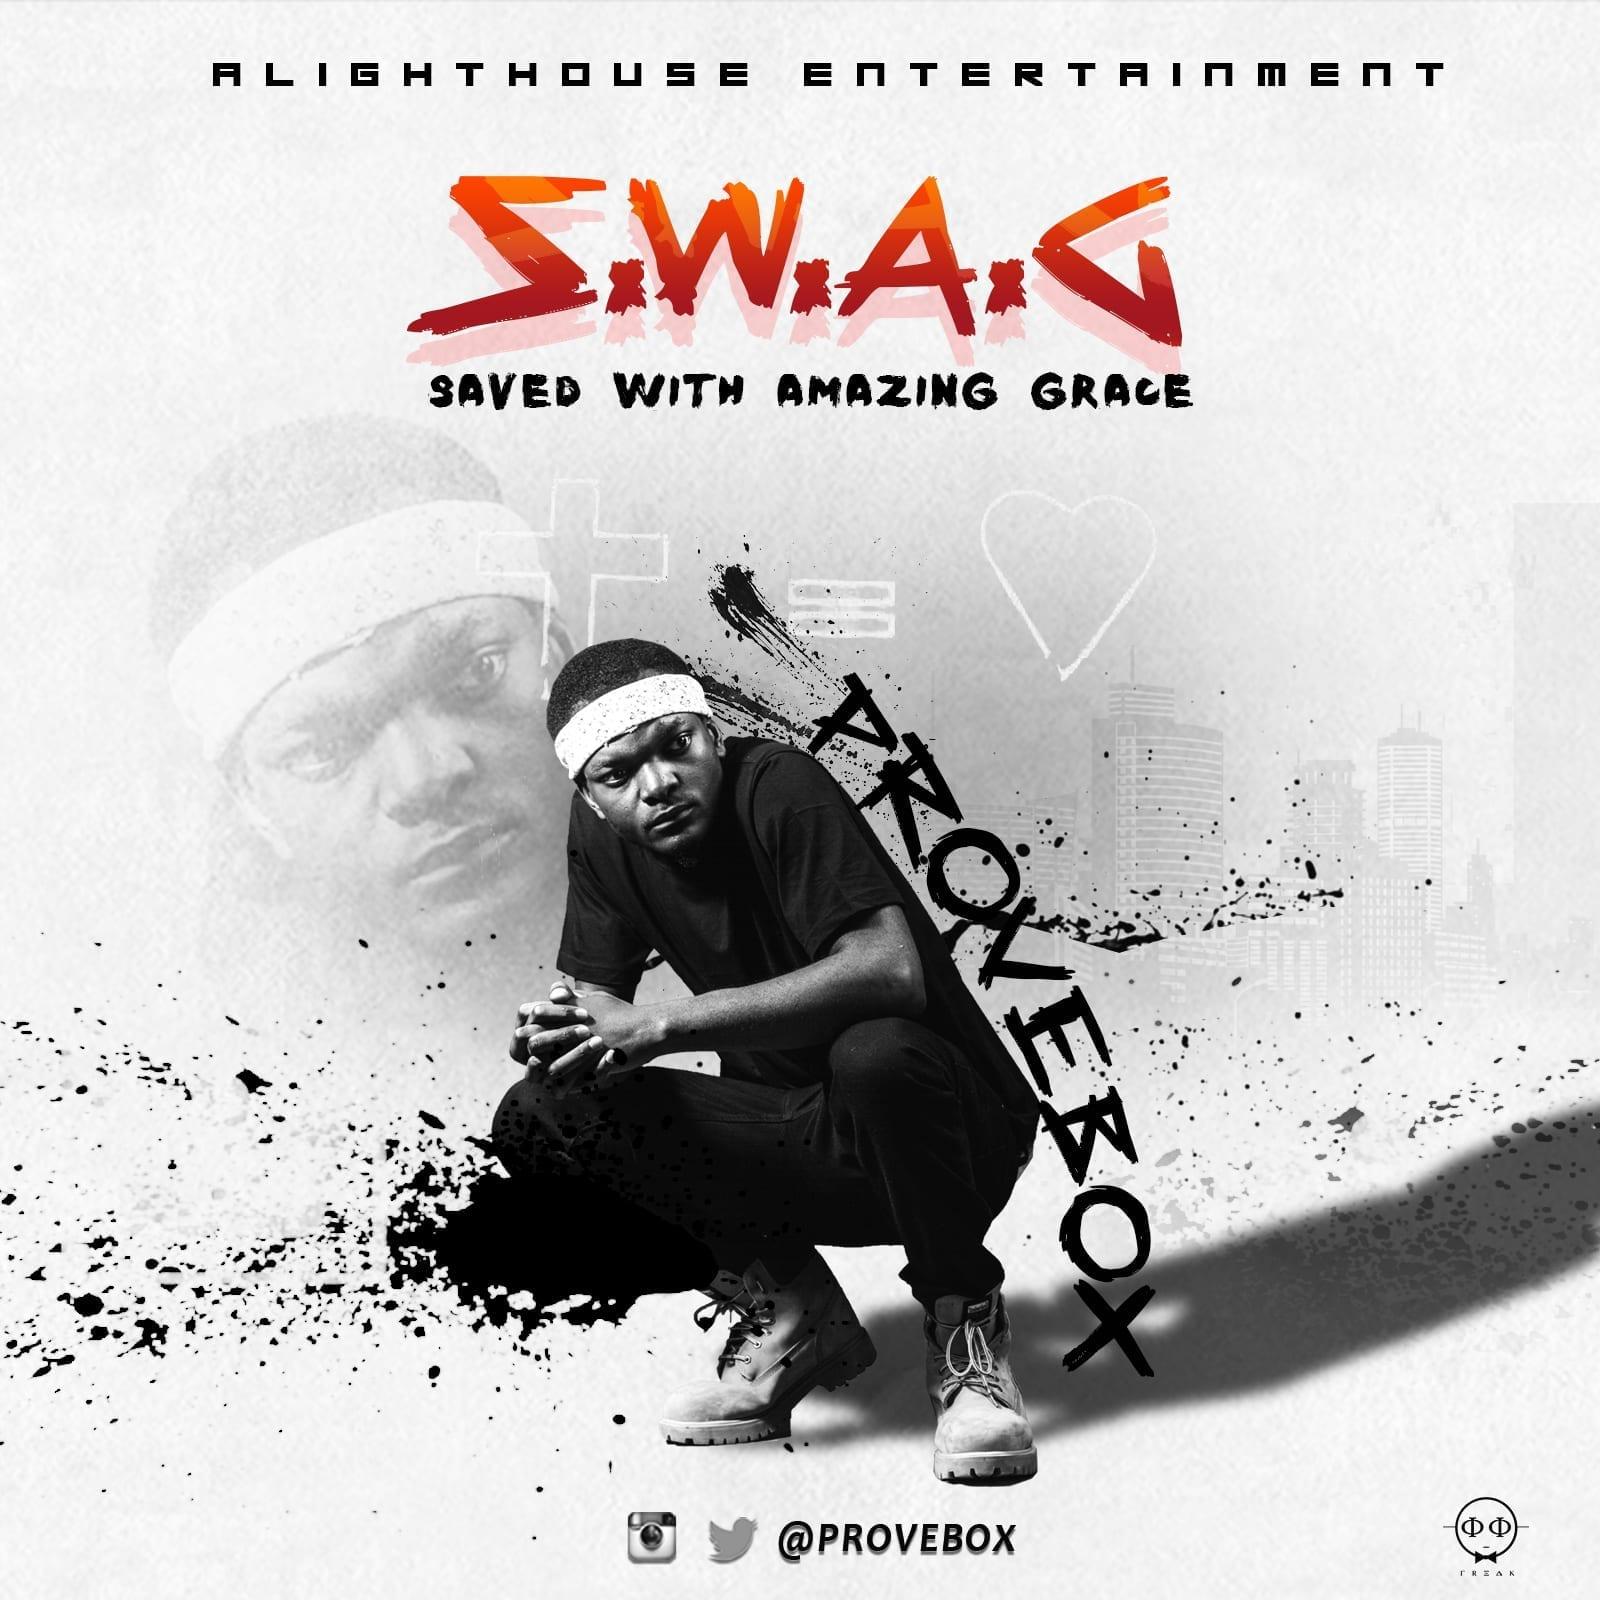 Prove Box (Oyi Ku Jesus) Drop's S.W.A.G. Download Now!